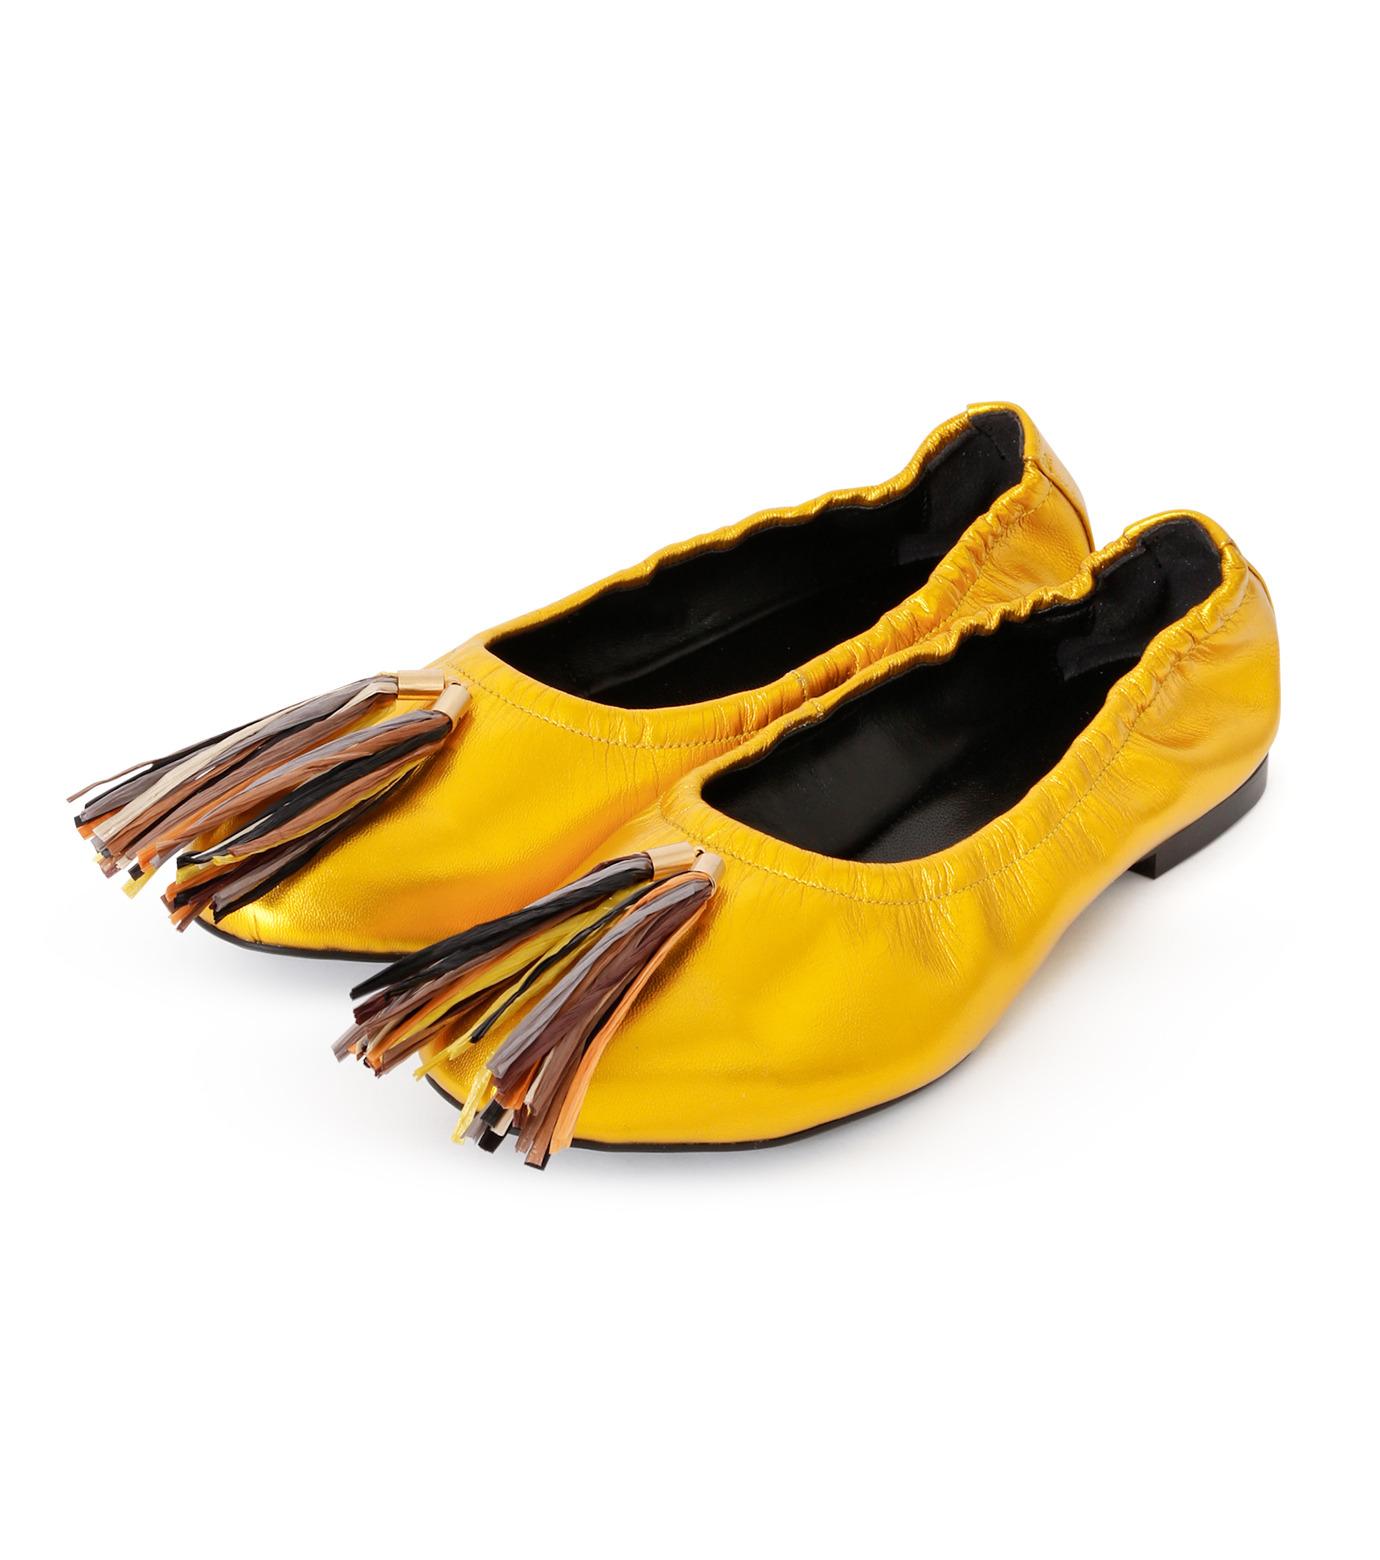 PIPPICHIC(ピッピシック)のballet shoes-GOLD(シューズ/shoes)-PP16BALLET19-2 拡大詳細画像2